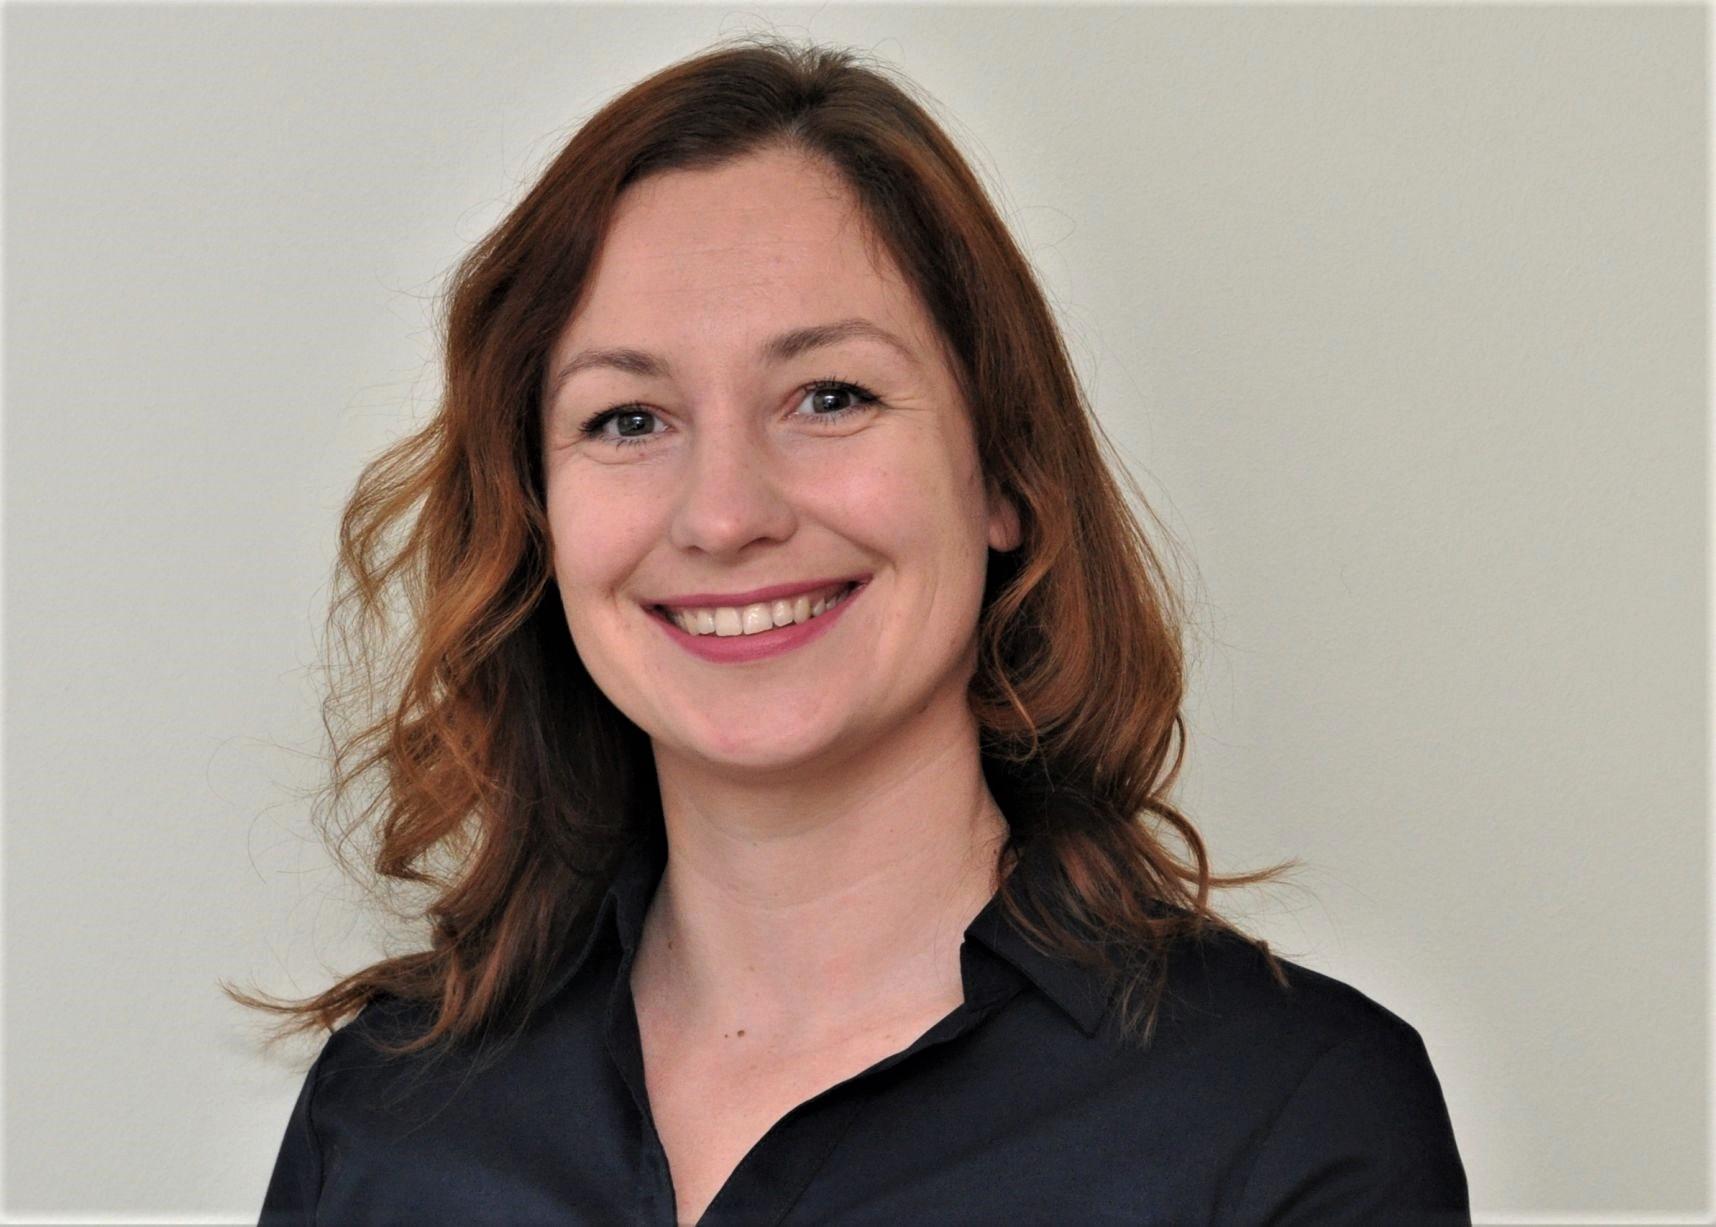 Picture of Ljudmilla Saar